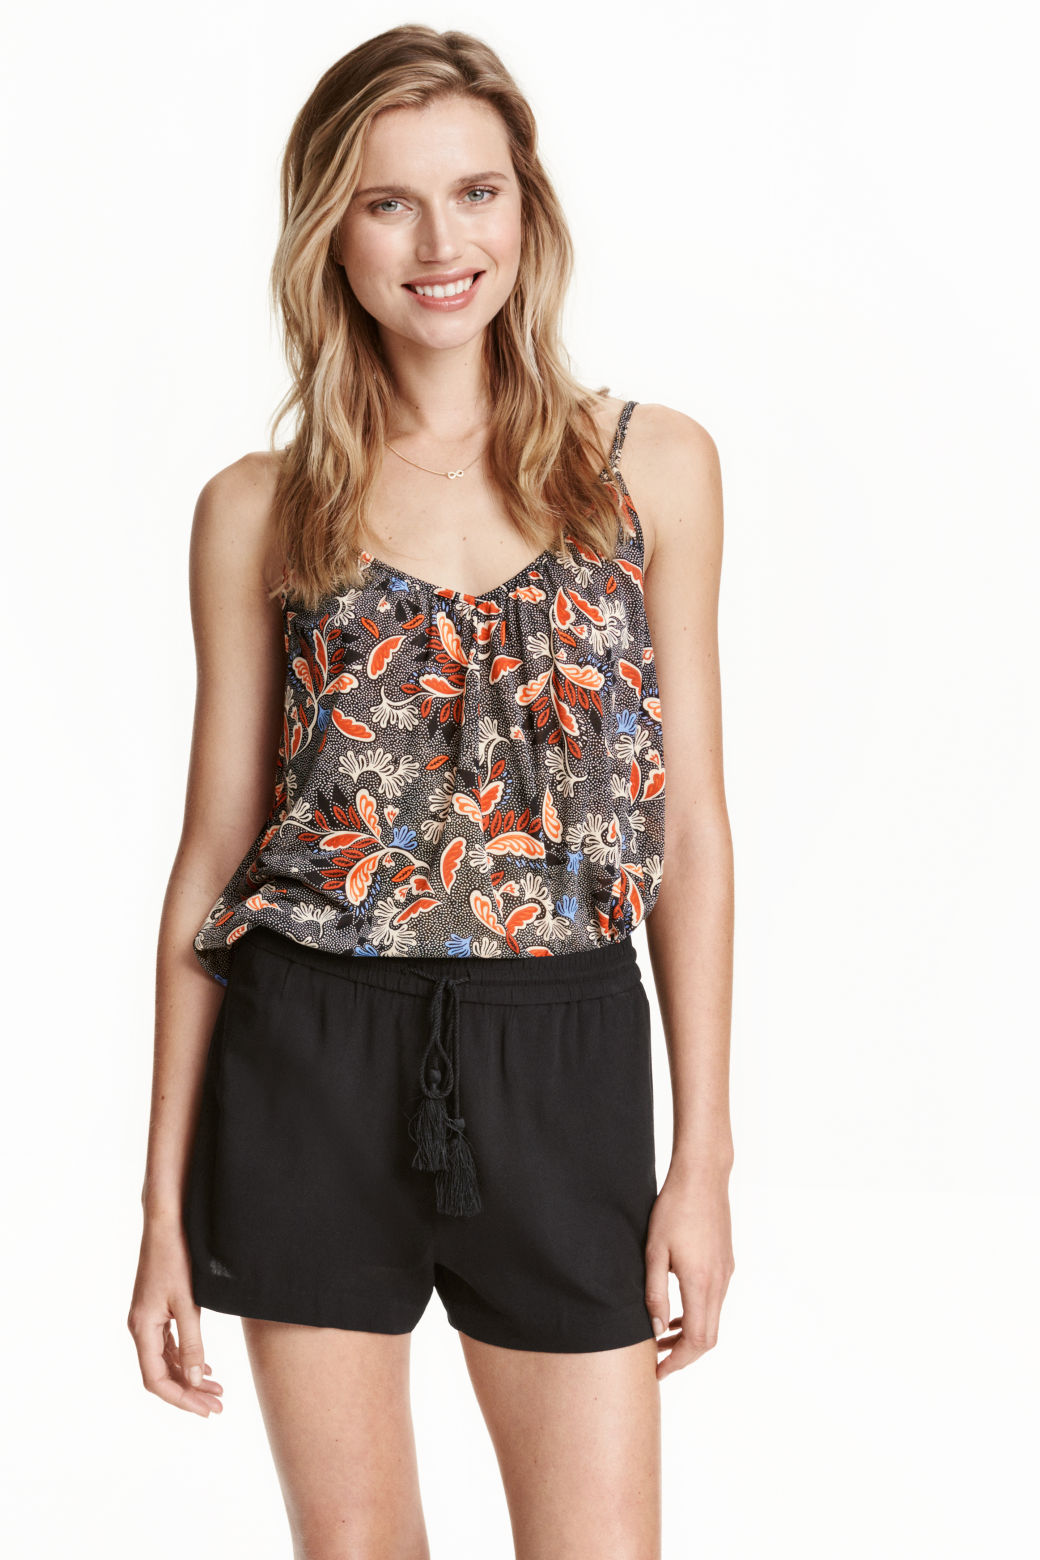 women 39 s tops shop tops for women online h m. Black Bedroom Furniture Sets. Home Design Ideas